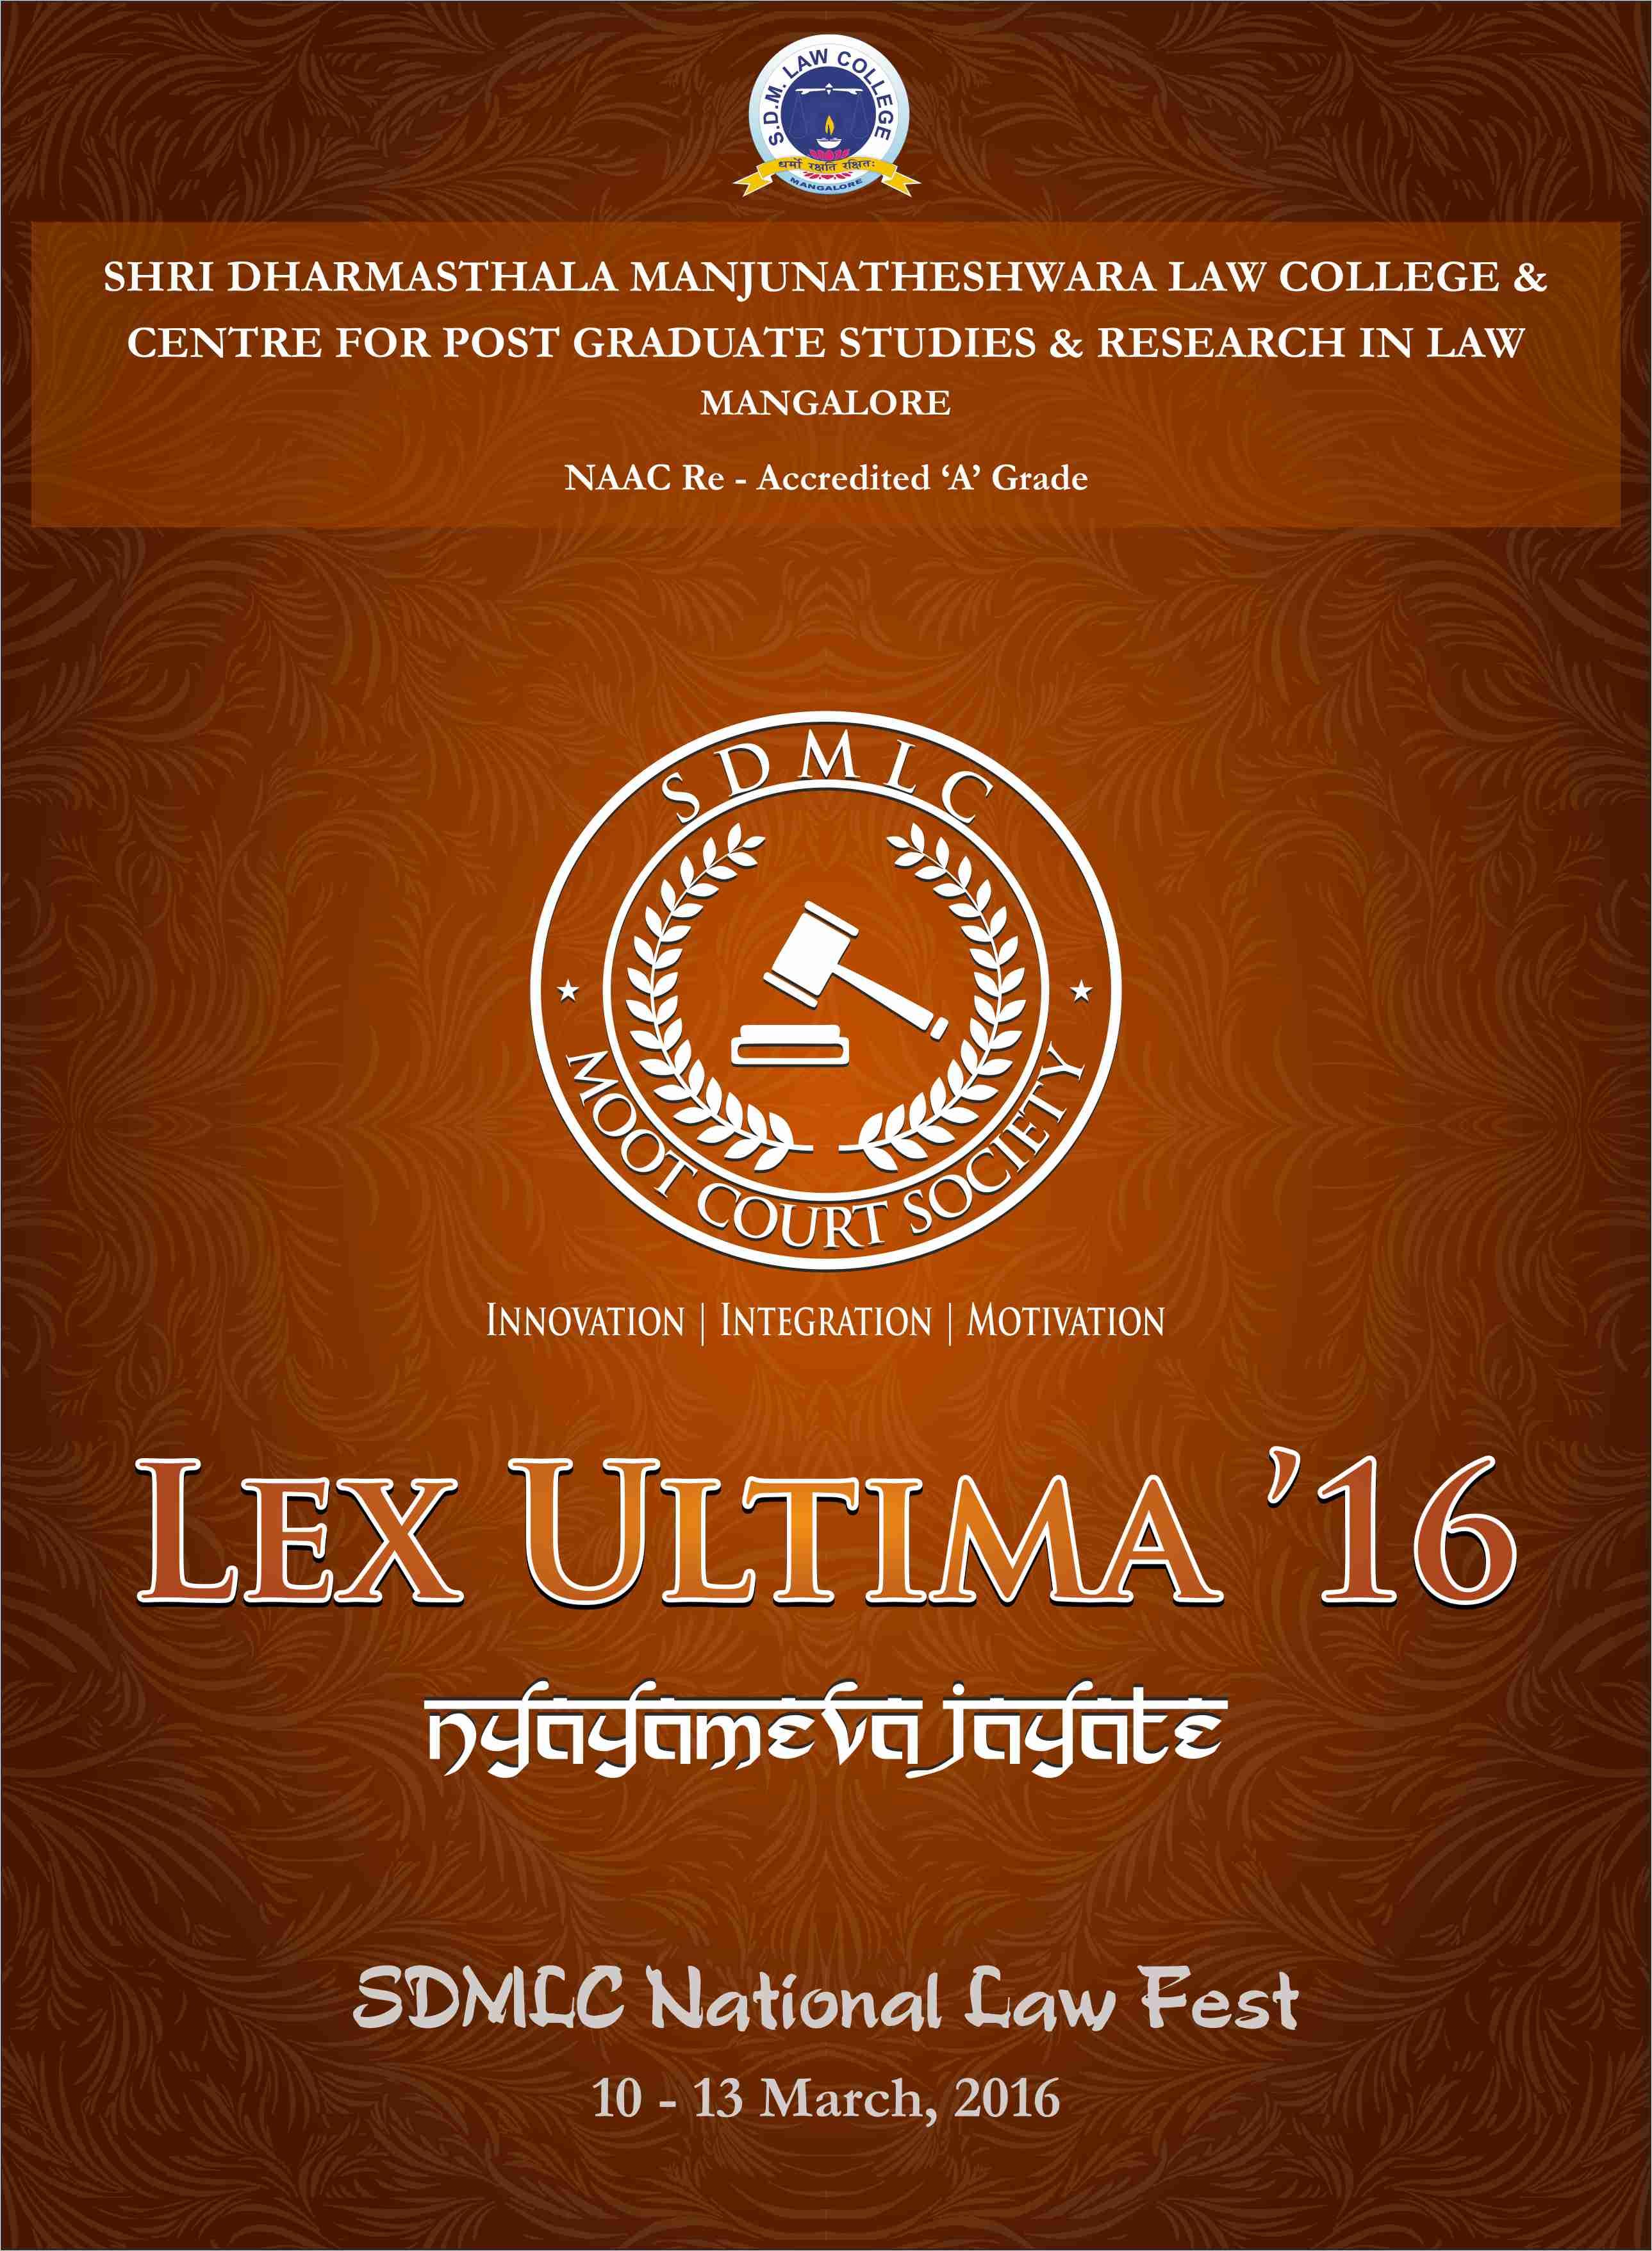 Shri Dharmasthala Manjunatheshwara Law College, Mangalore's Law Fest 'Lex Ultima 2016'